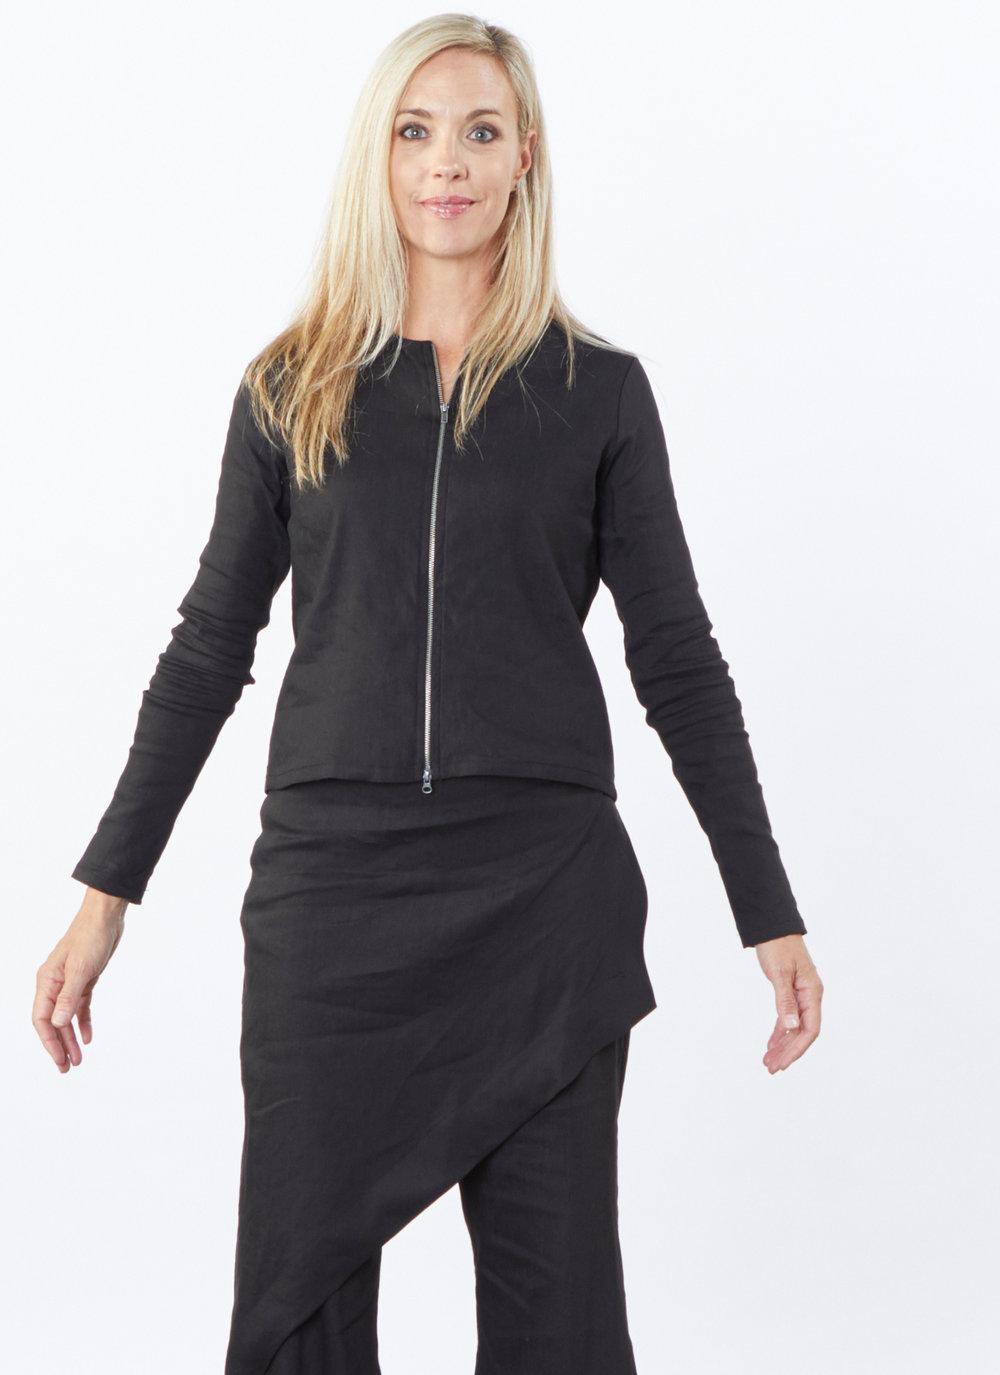 Betz Jacket, Sofia Pant in Black Ready for Bologna